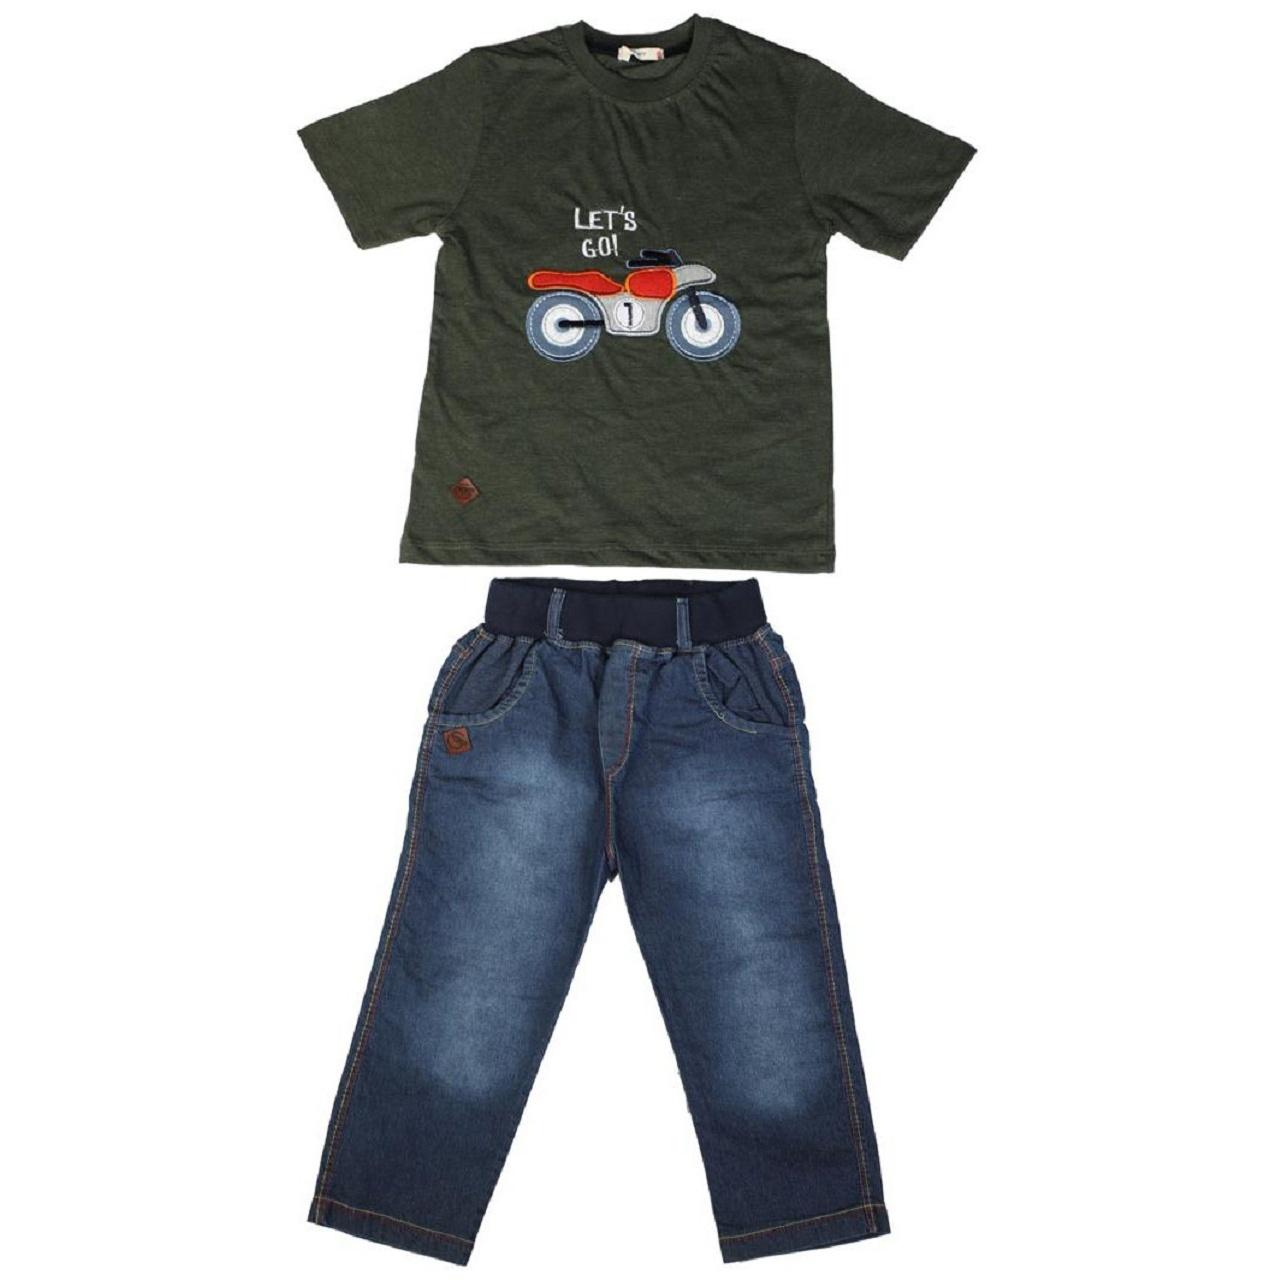 ست تی شرت و شلوارک پسرانه گراکو طرح موتور کد 119